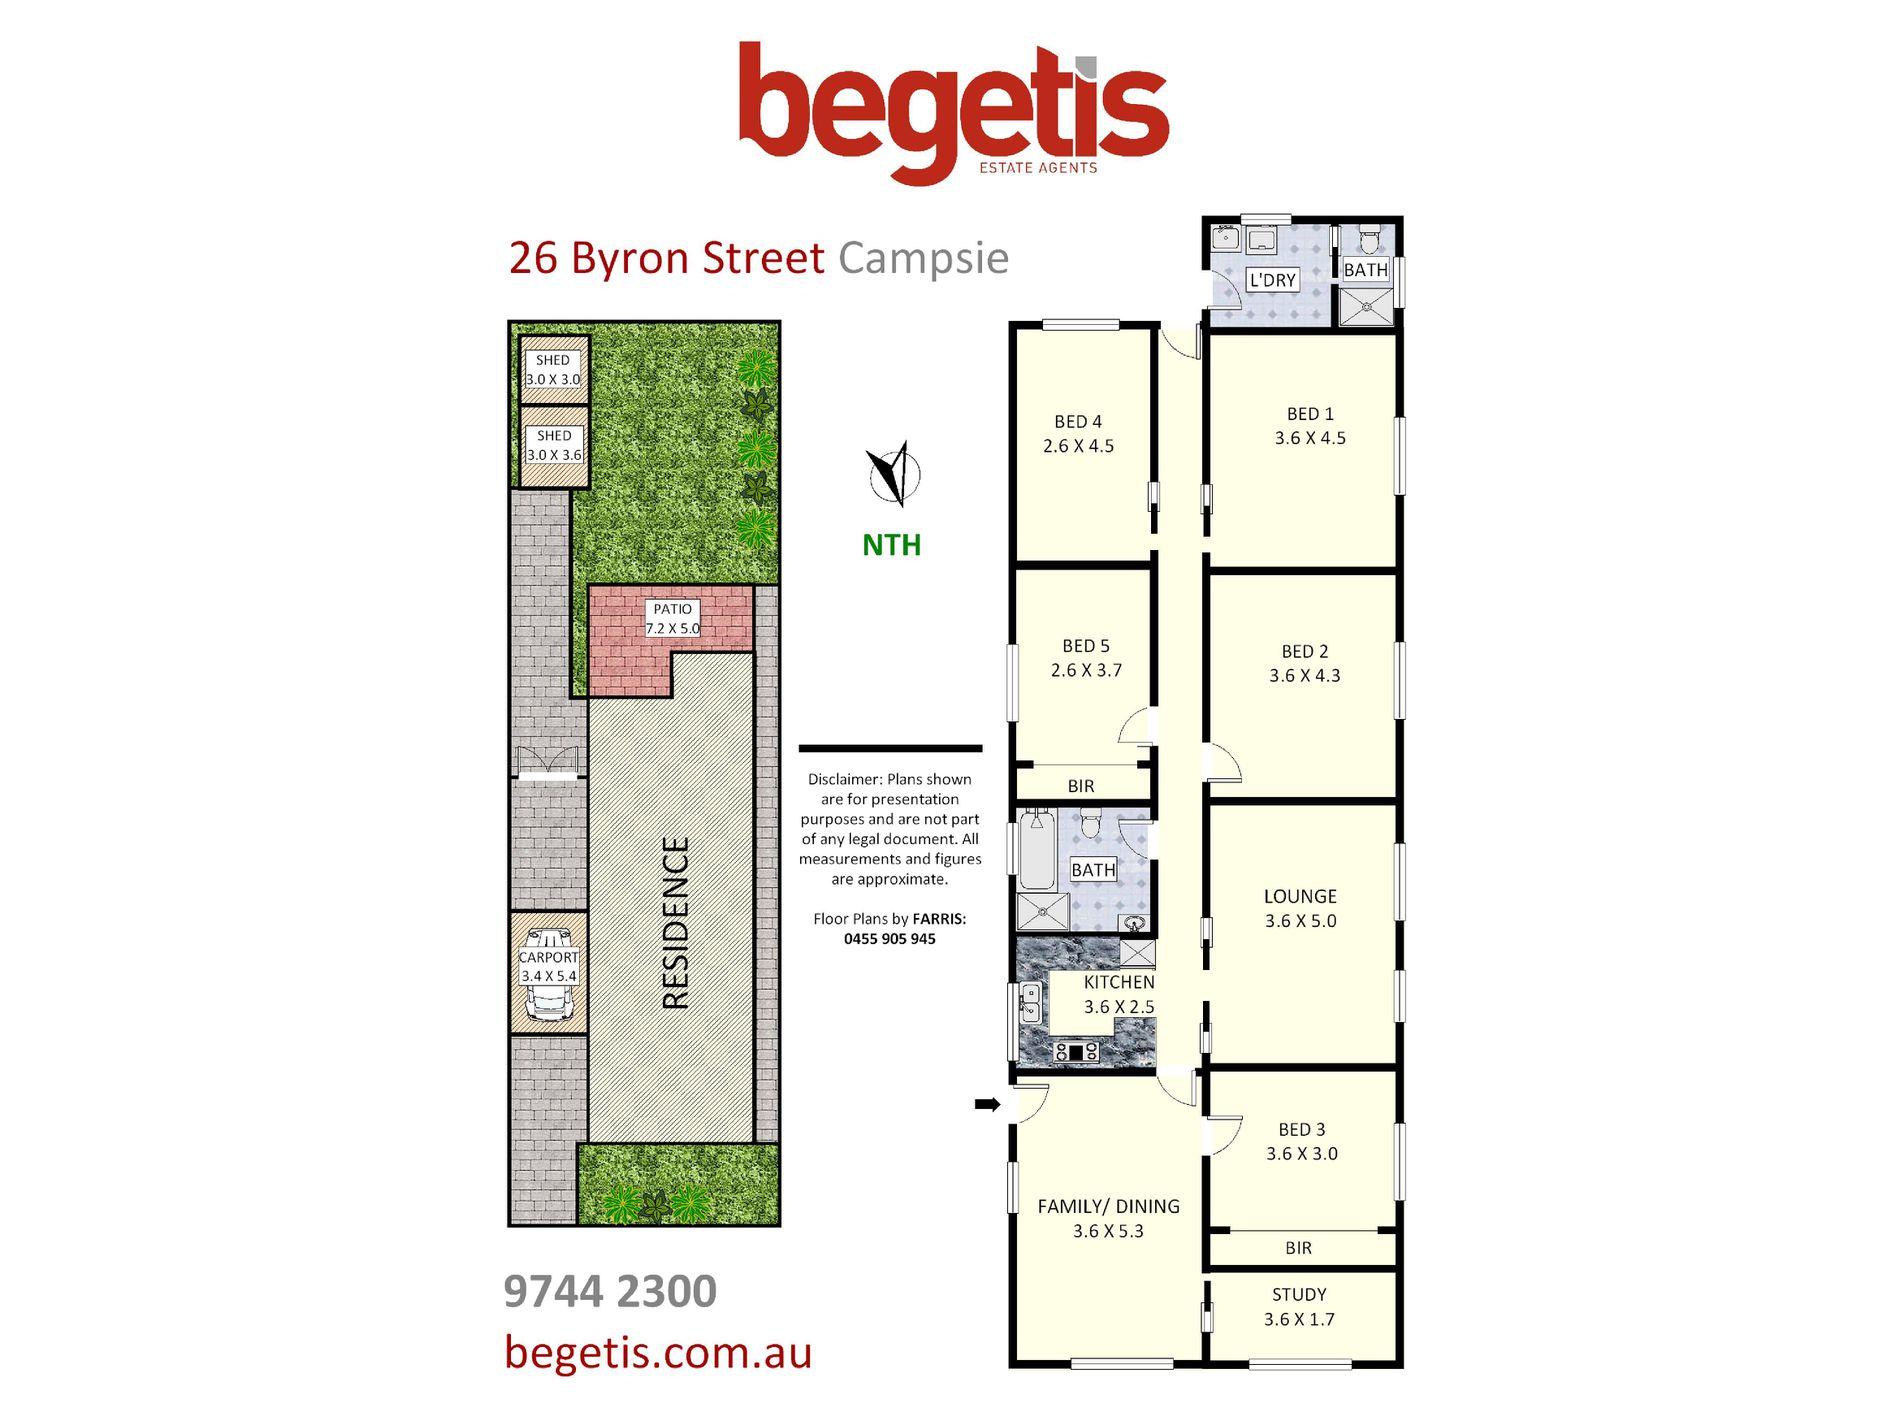 26 Byron Street, Campsie